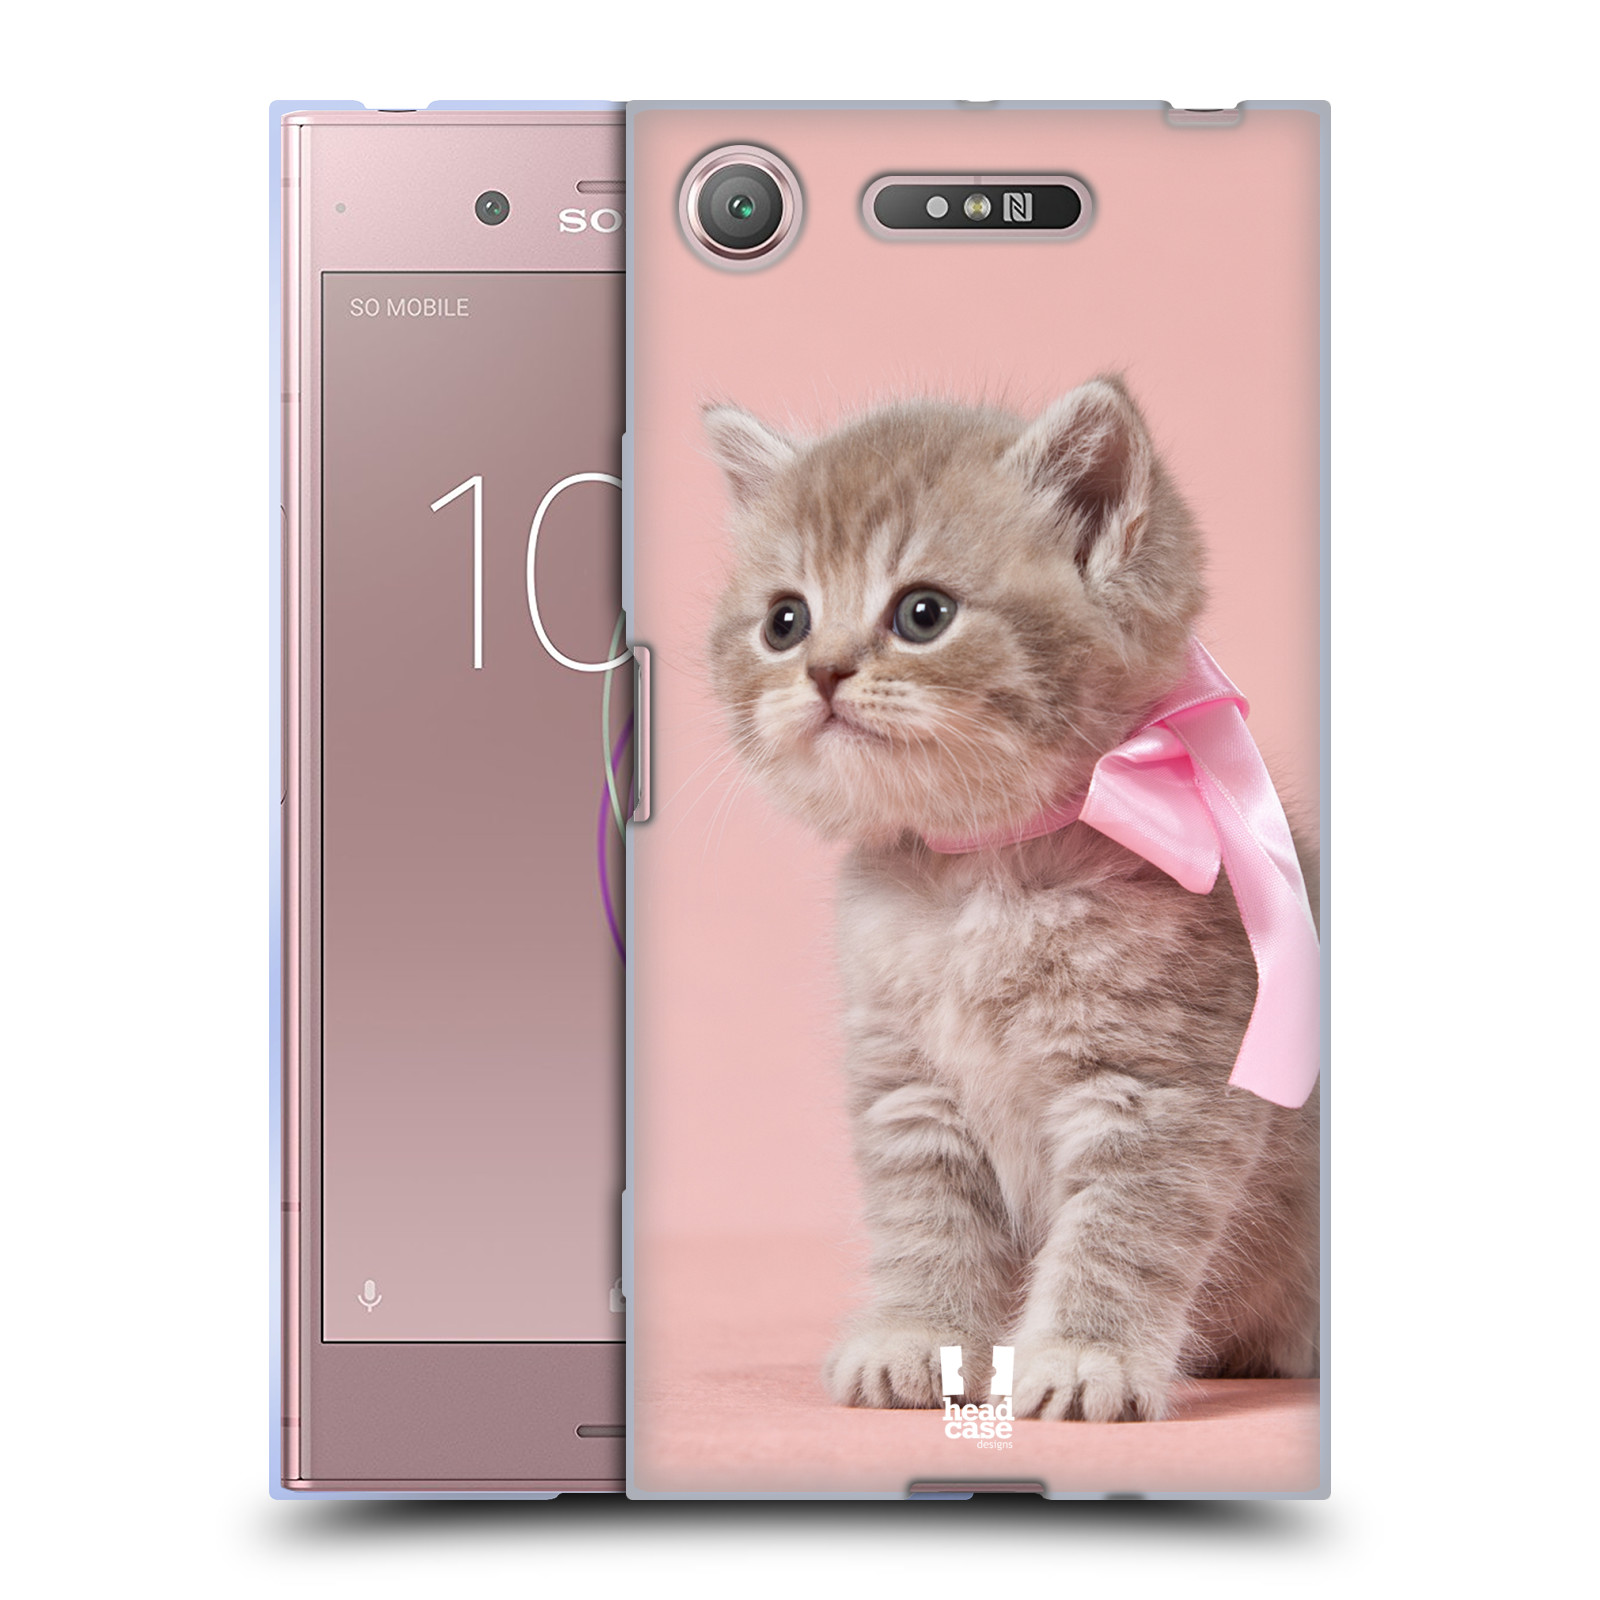 Silikonové pouzdro na mobil Sony Xperia XZ1 - Head Case - KOTĚ S MAŠLÍ